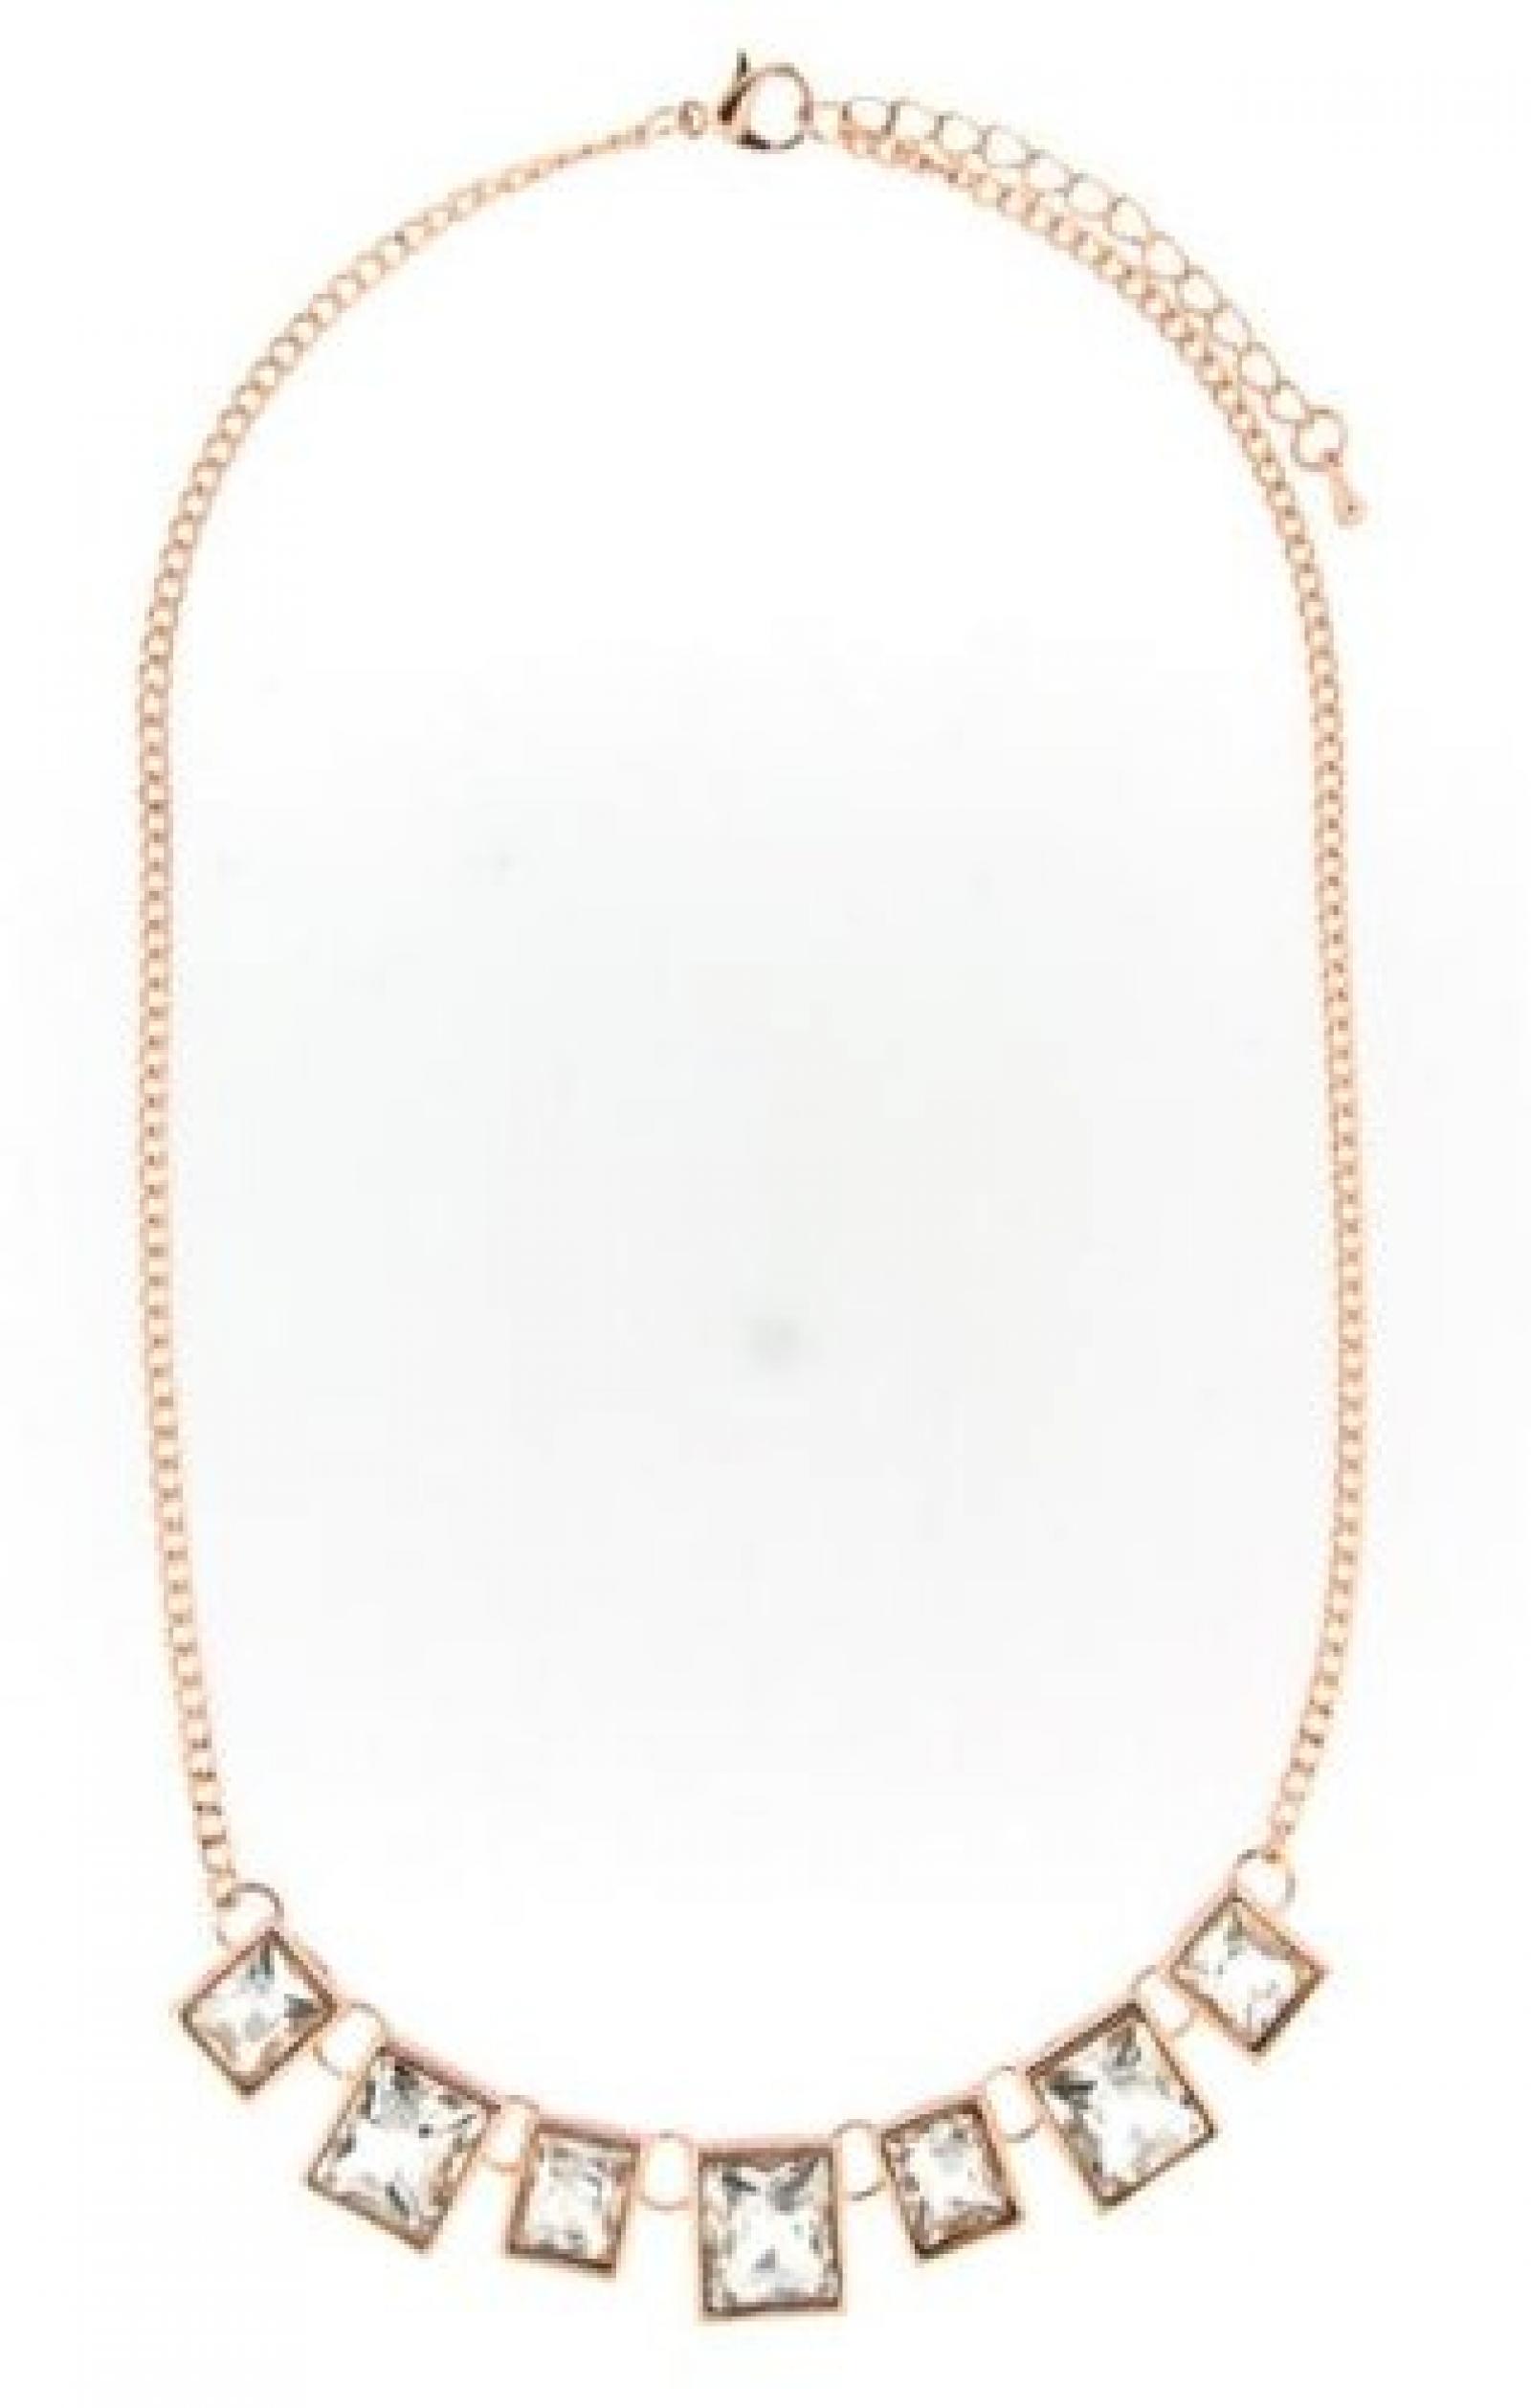 Sweet Deluxe Damen-Halskette Messing sweet deluxe Damen Kette Susana rose gold/crystal 02801 2801